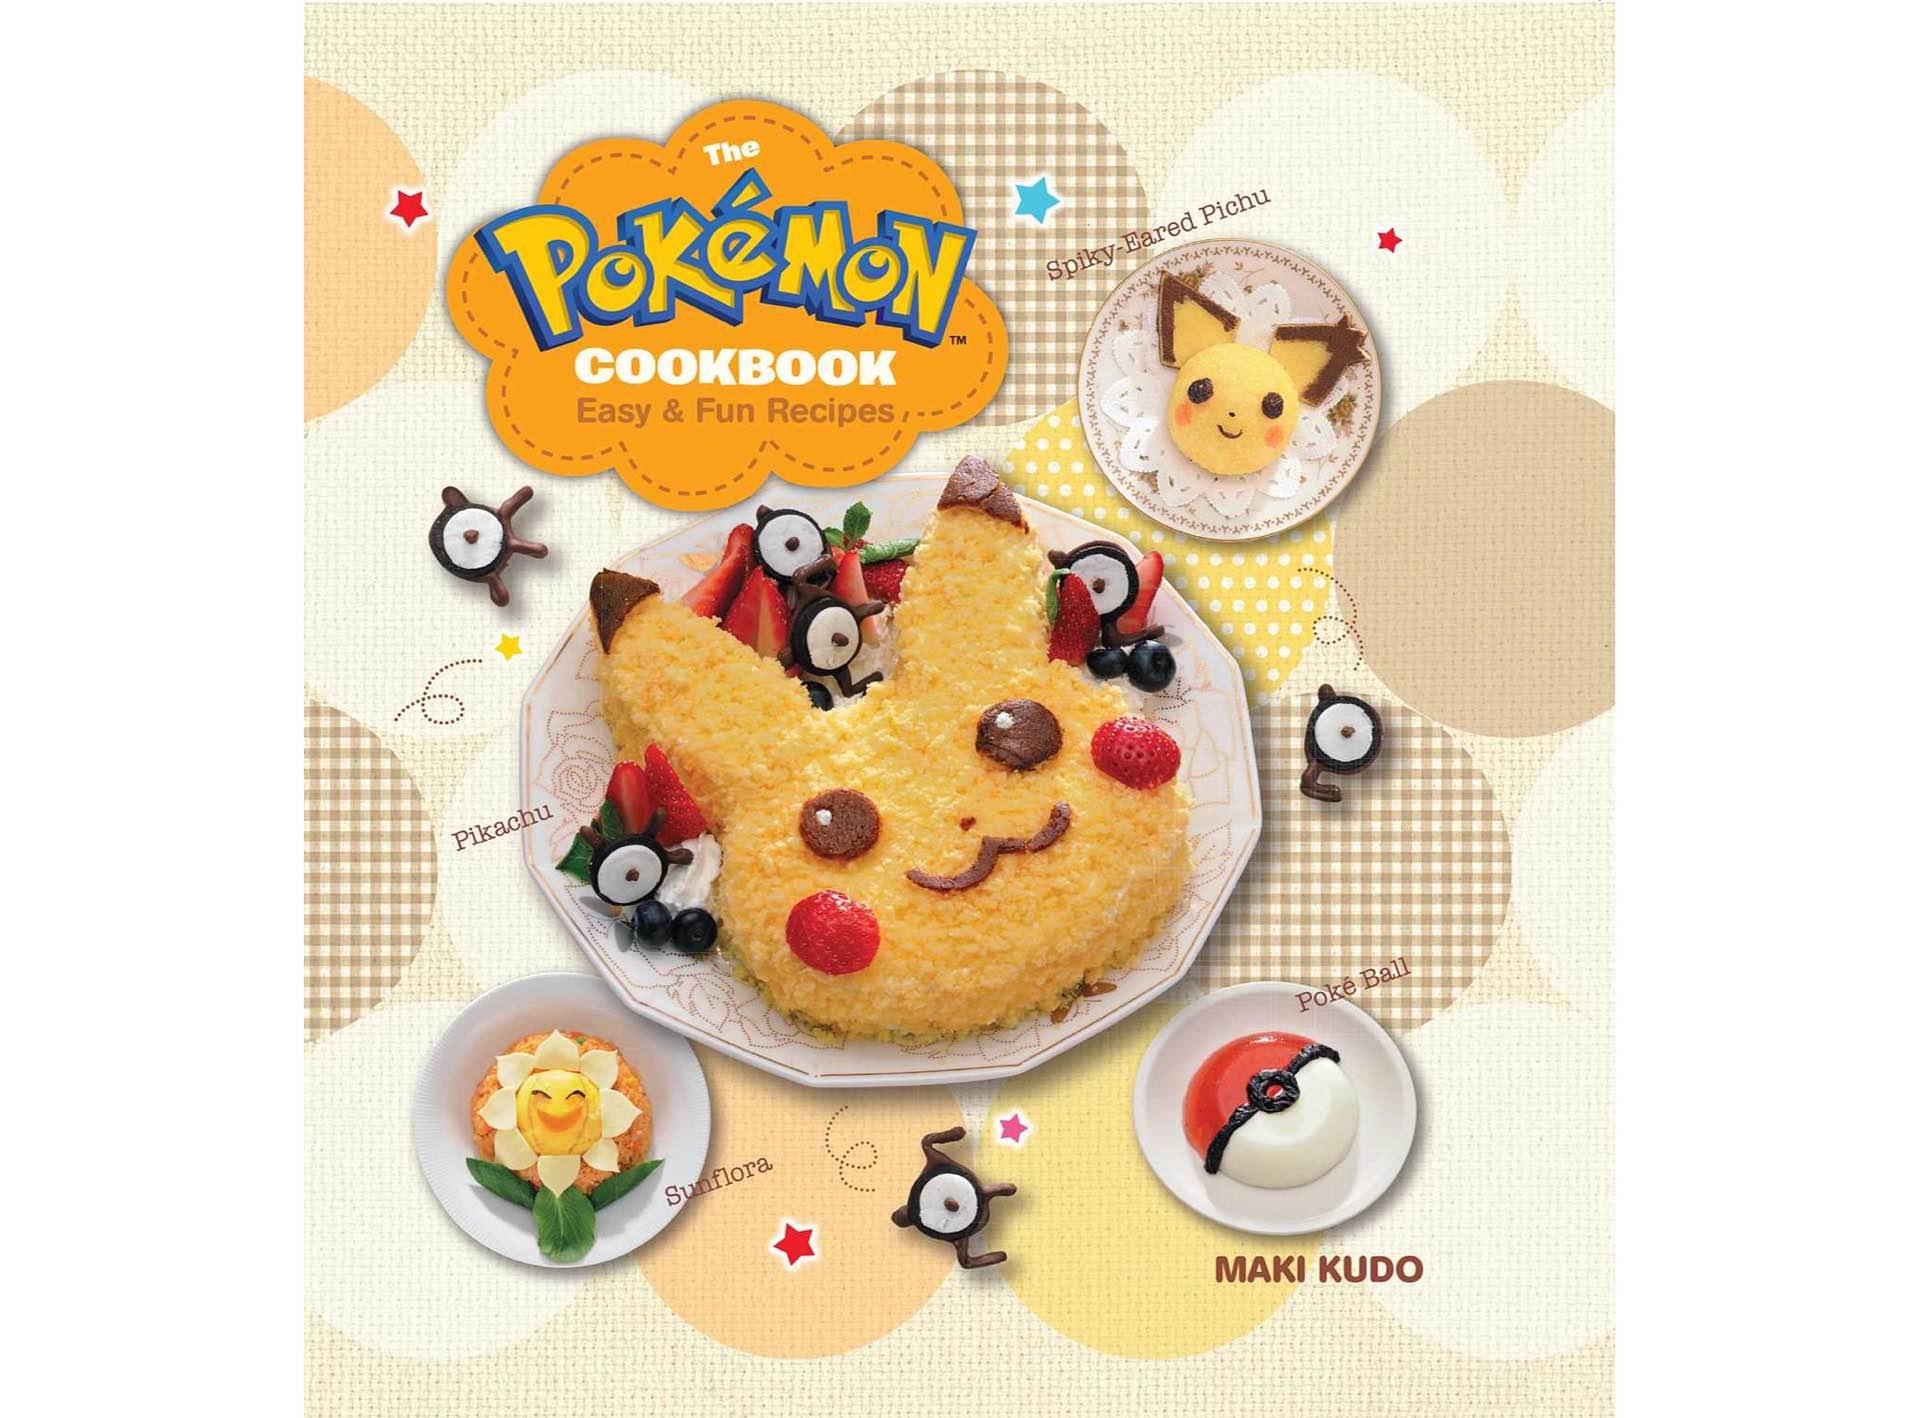 The Pokémon Cookbook: Easy & Fun Recipes by Maki Kudo.